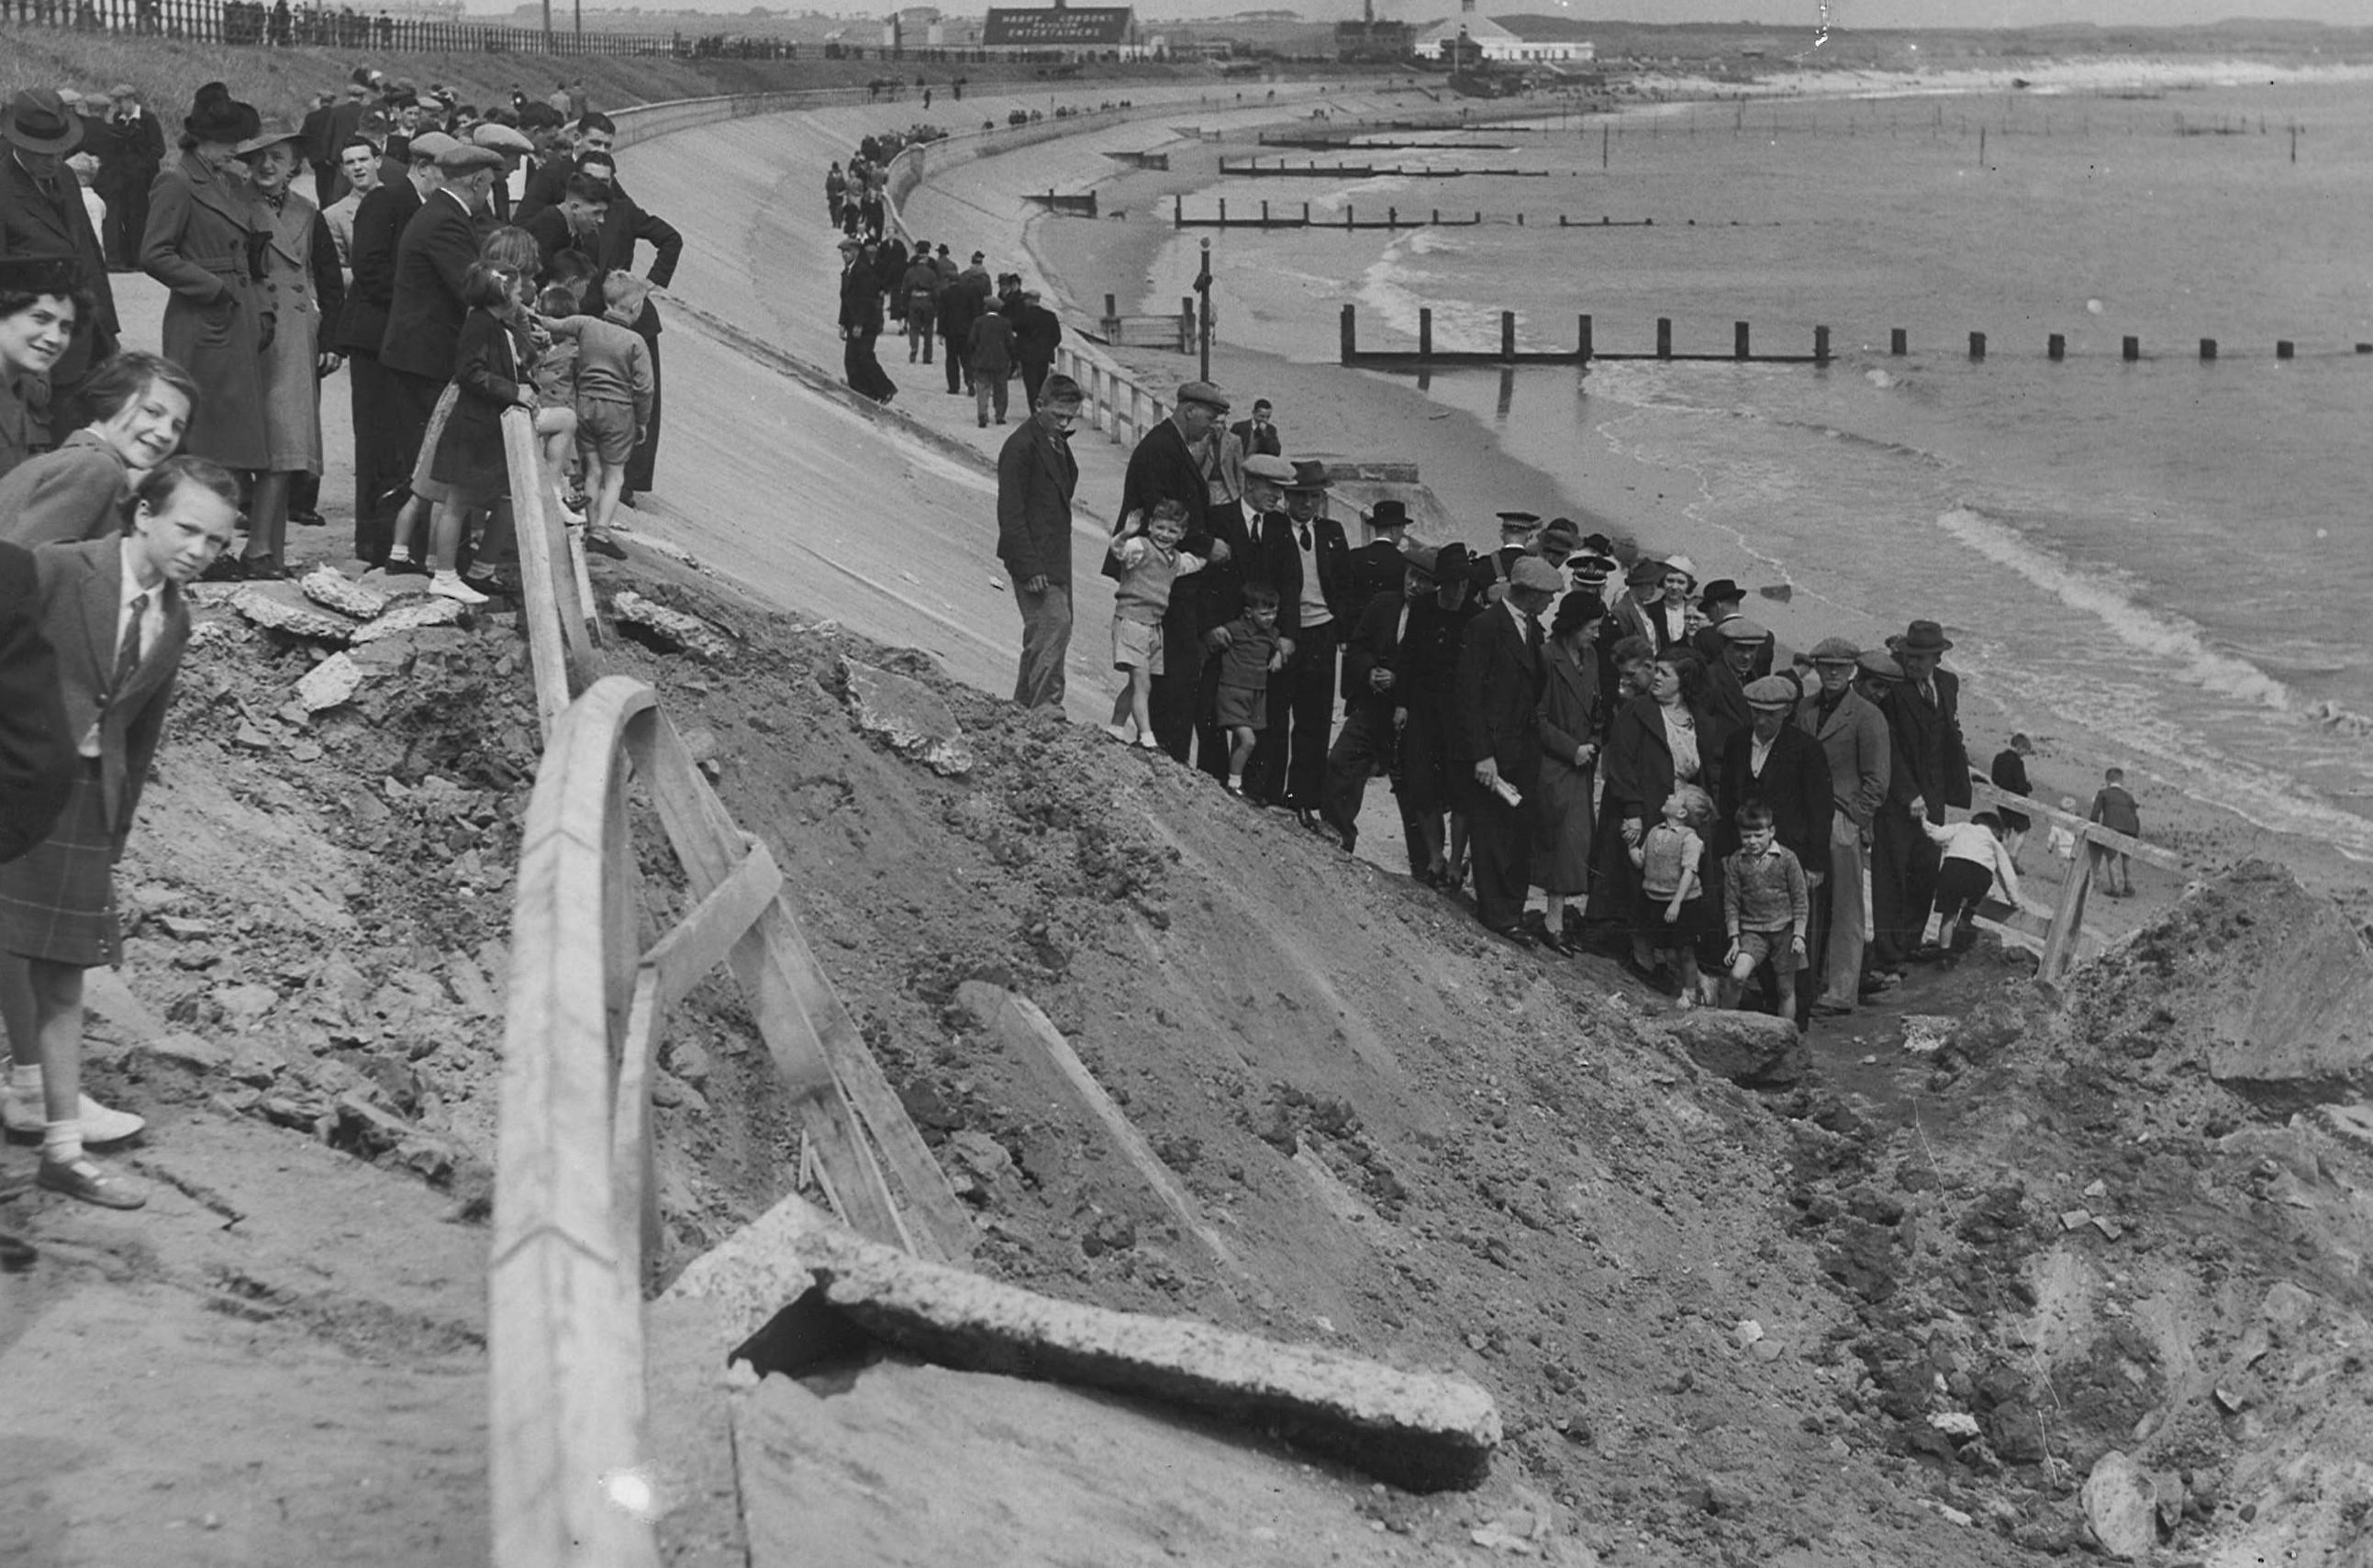 Bomb damage at Aberdeen Beach, 1 July 1941